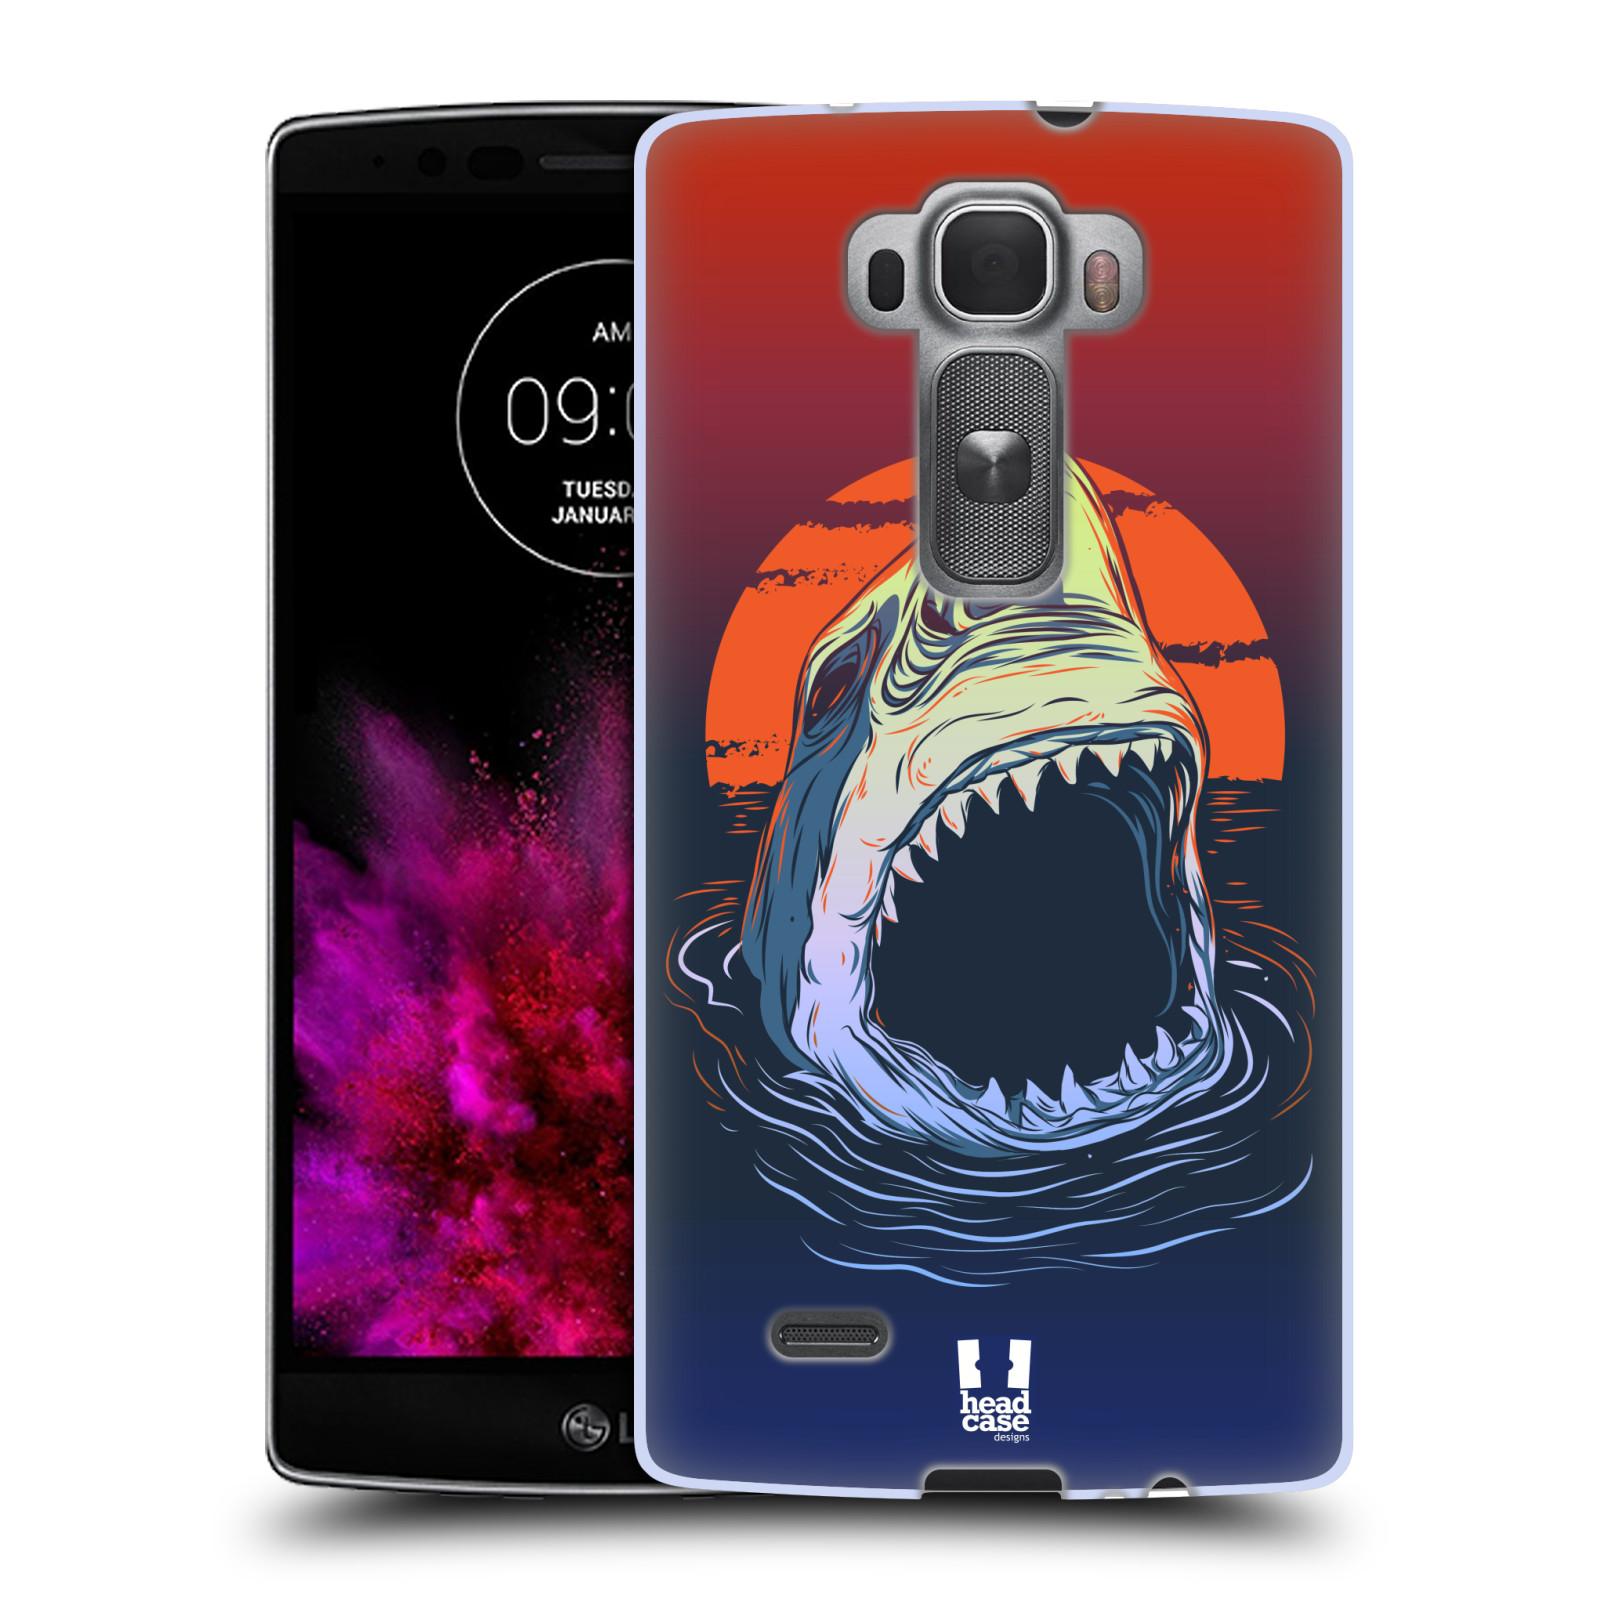 Silikonové pouzdro na mobil LG G Flex 2 HEAD CASE HLADOVÝ ŽRALOK (Silikonový kryt či obal na mobilní telefon LG G Flex 2 H955)